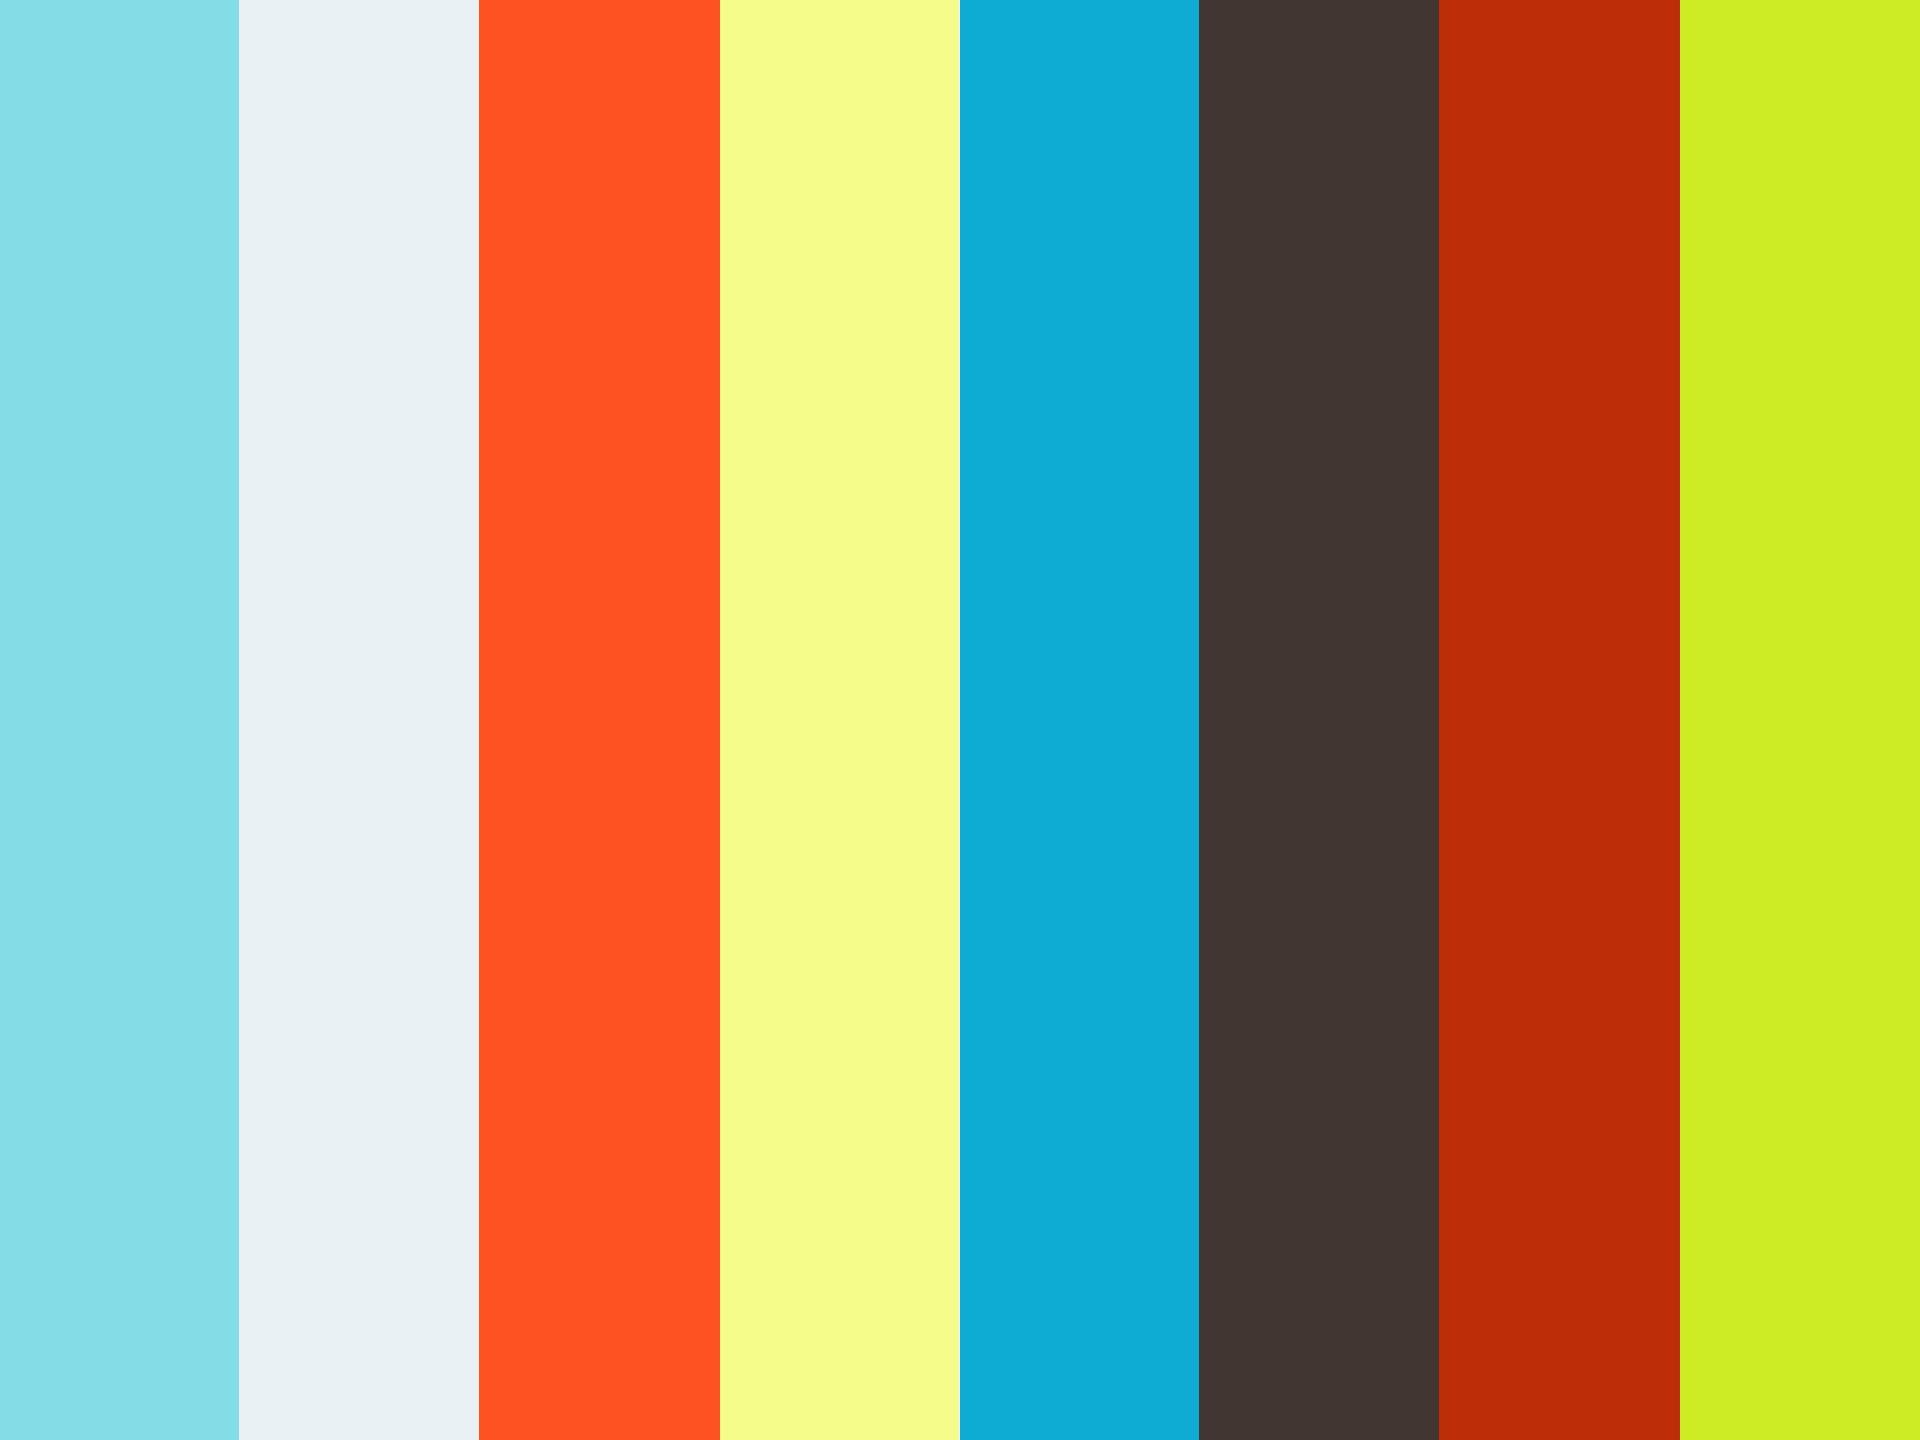 【User Voice】髙田光彦先生インタビュー:マイクロスコープの有用性【FLEXION】